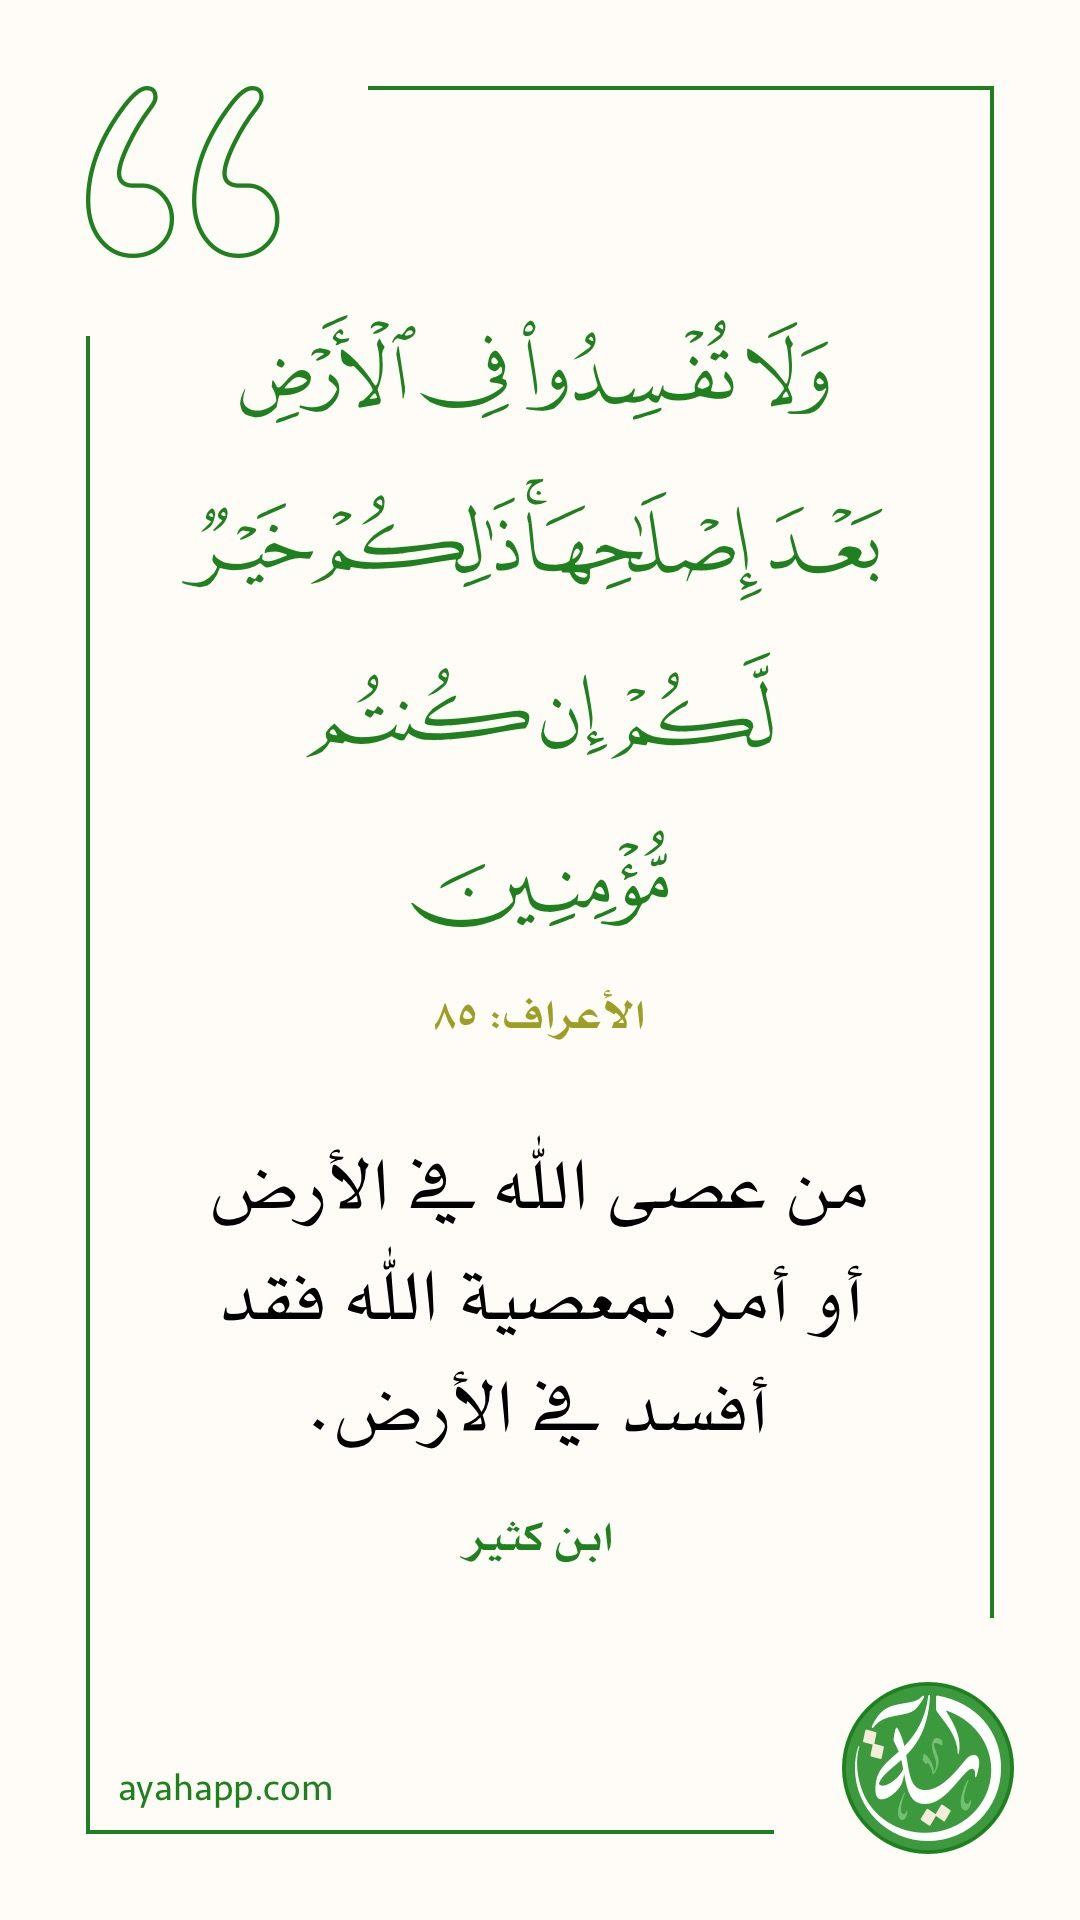 Pin By محبة الخير On بالقرآن نحيا Islamic Phrases Quran Quotes Quran Verses